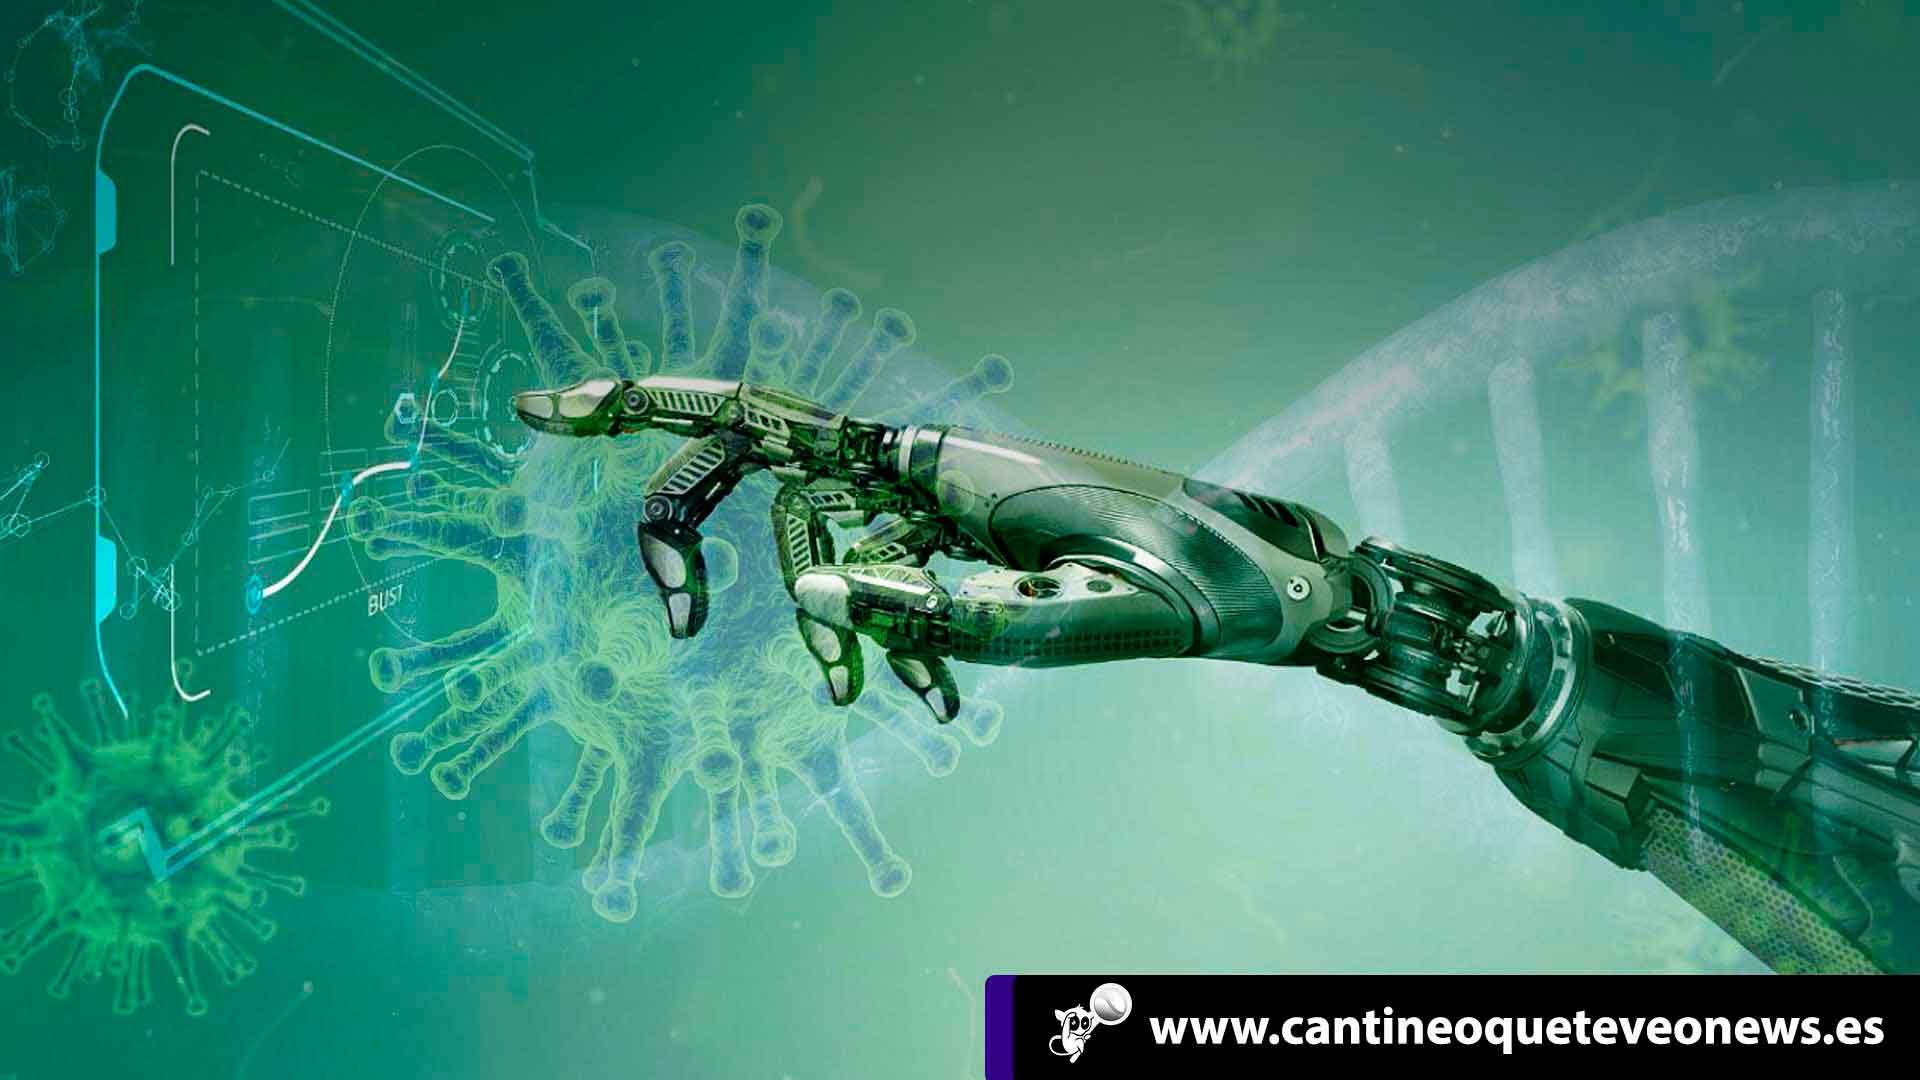 posibilidades de la robótica - Cantineoqueteveonews